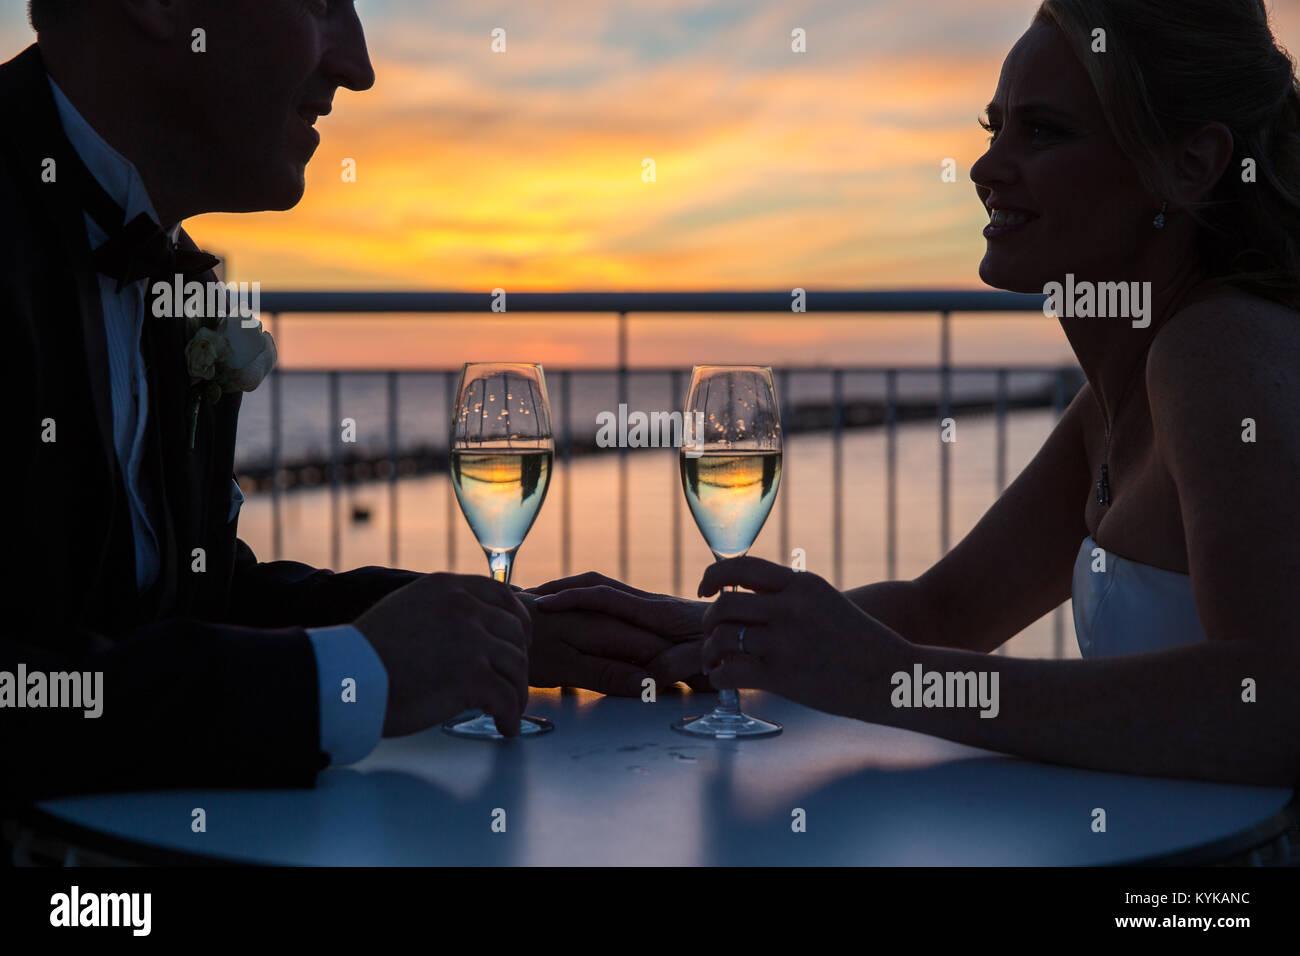 Wine glasses on balcony overlooking St Kilda pier at sunset - Stock Image